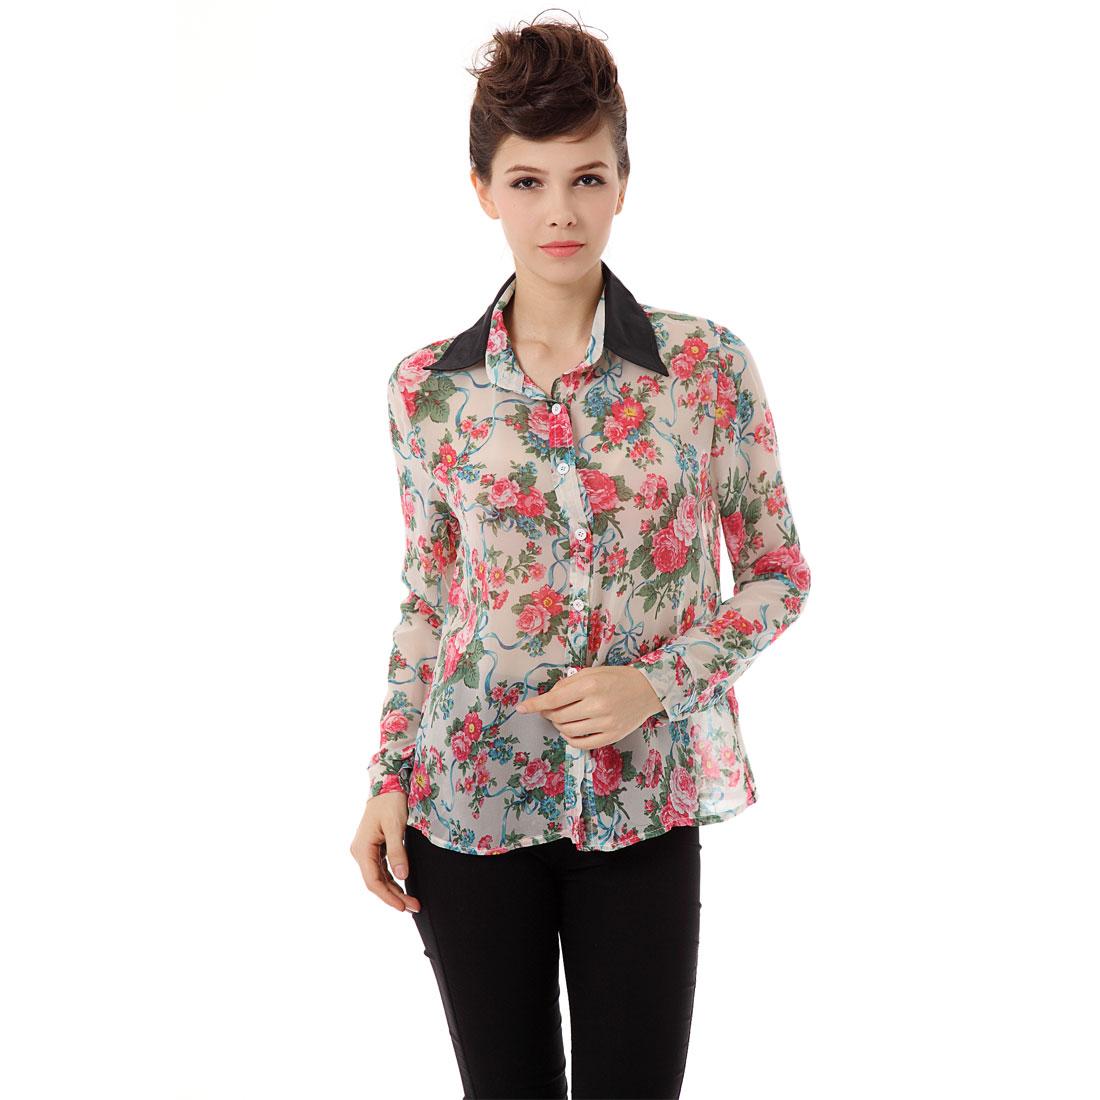 Woman White Chiffon Flowery Long Sleeve Blouse Tops L